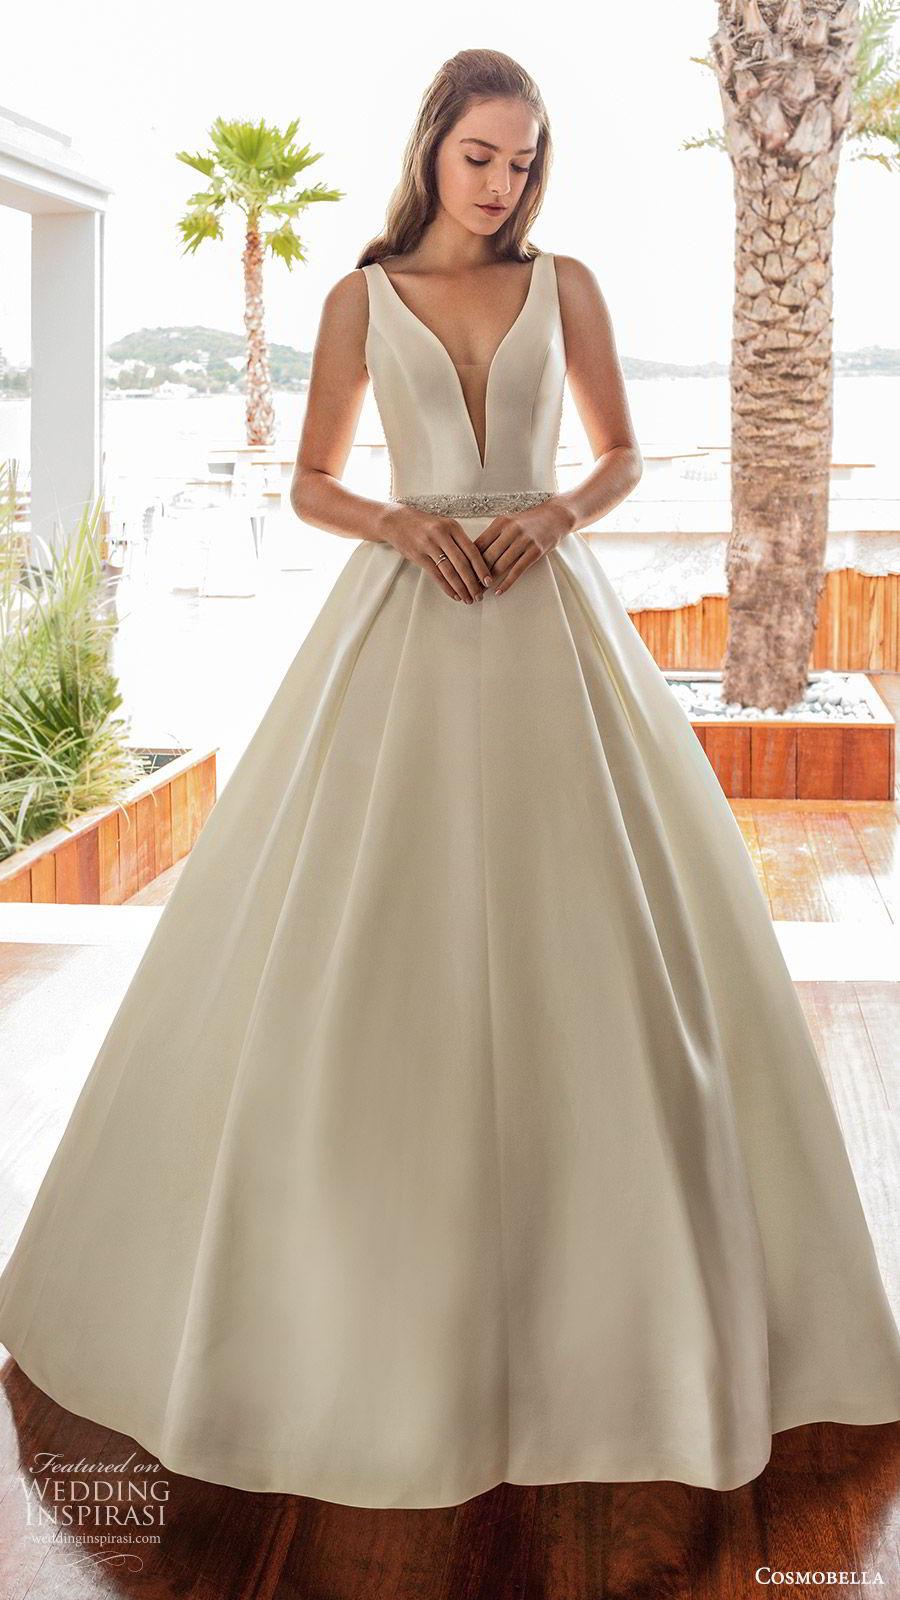 cosmobella 2020 bridal sleeveless thick straps deep v neckline split sweetheart a line ball gown wedding dress (17) princess romantic sheer lace back chapel train mv